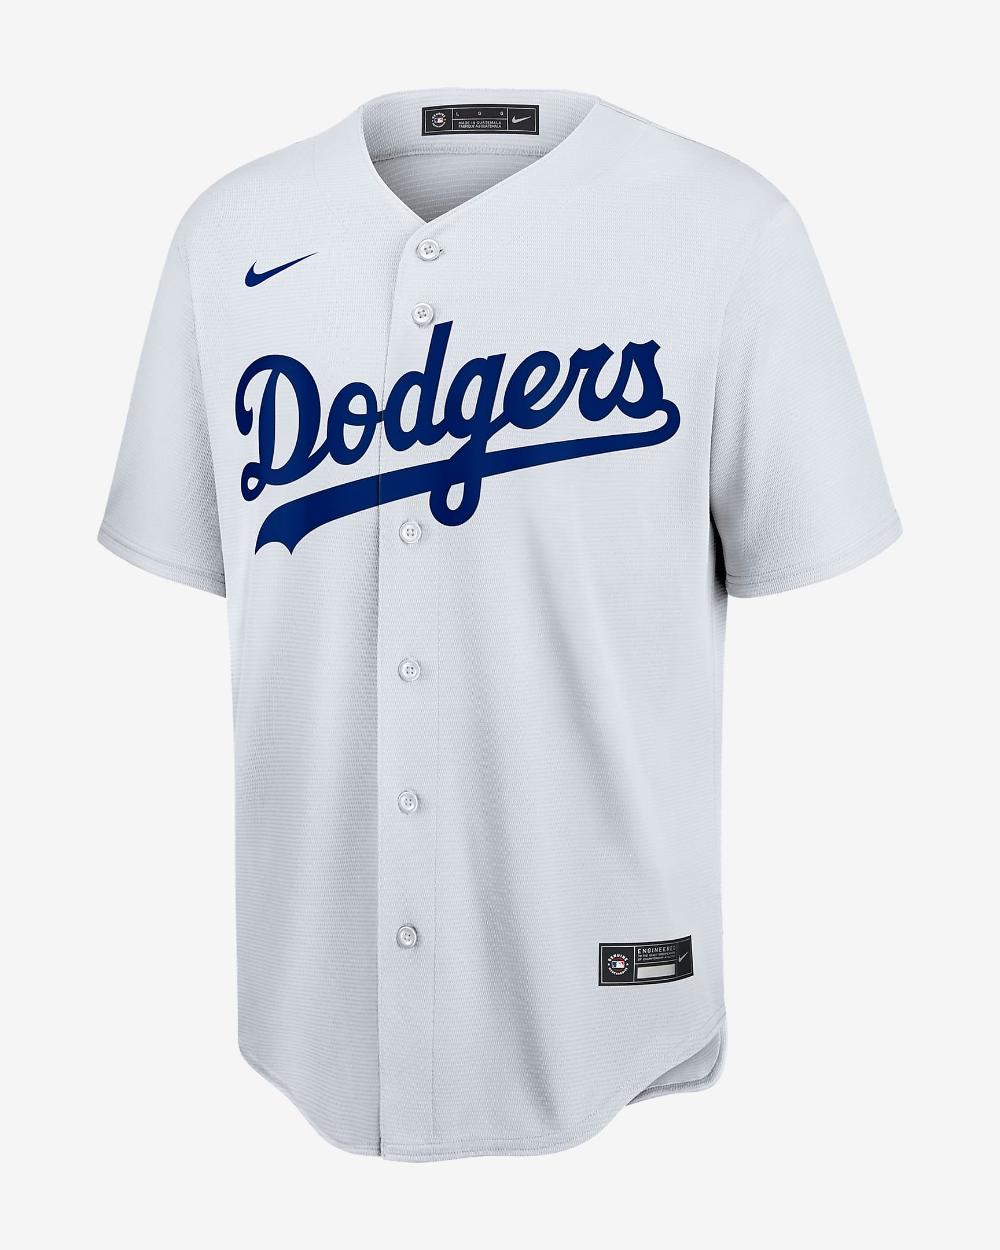 Mlb Los Angeles Dodgers Mookie Betts Men S Replica Baseball Jersey Nike Com In 2020 Dodgers Los Angeles Dodgers Baseball Jerseys